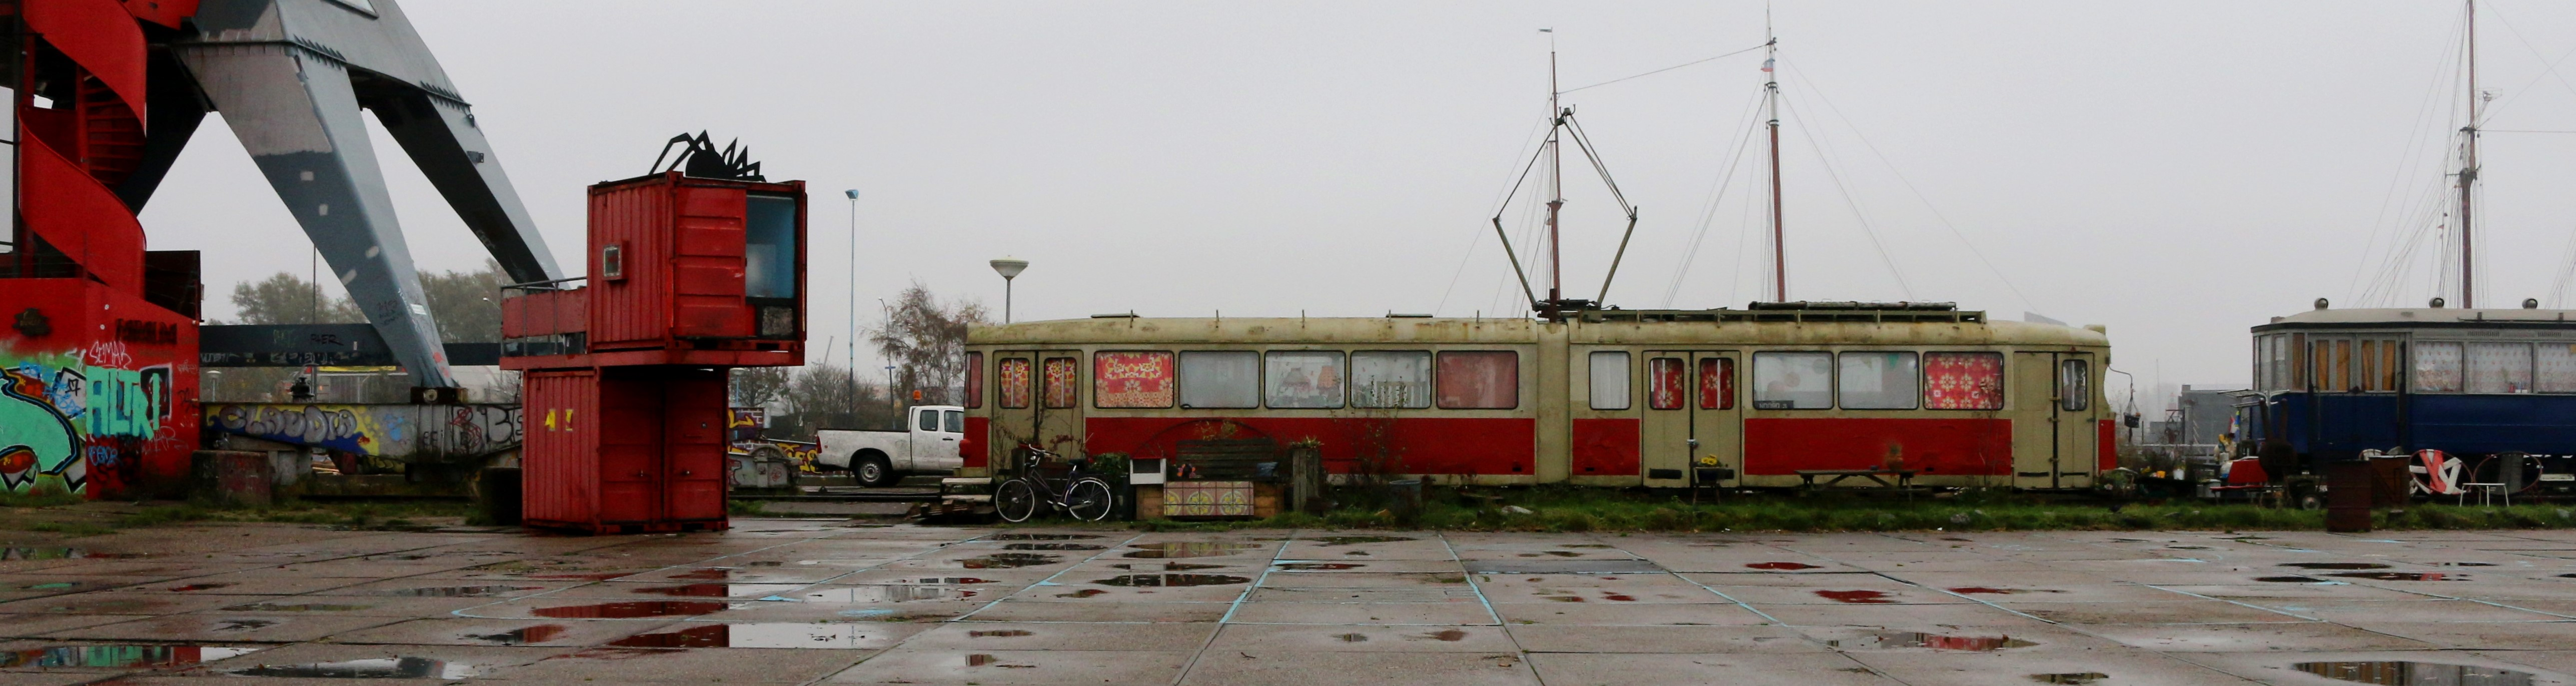 NDSM-Werft Amsterdam